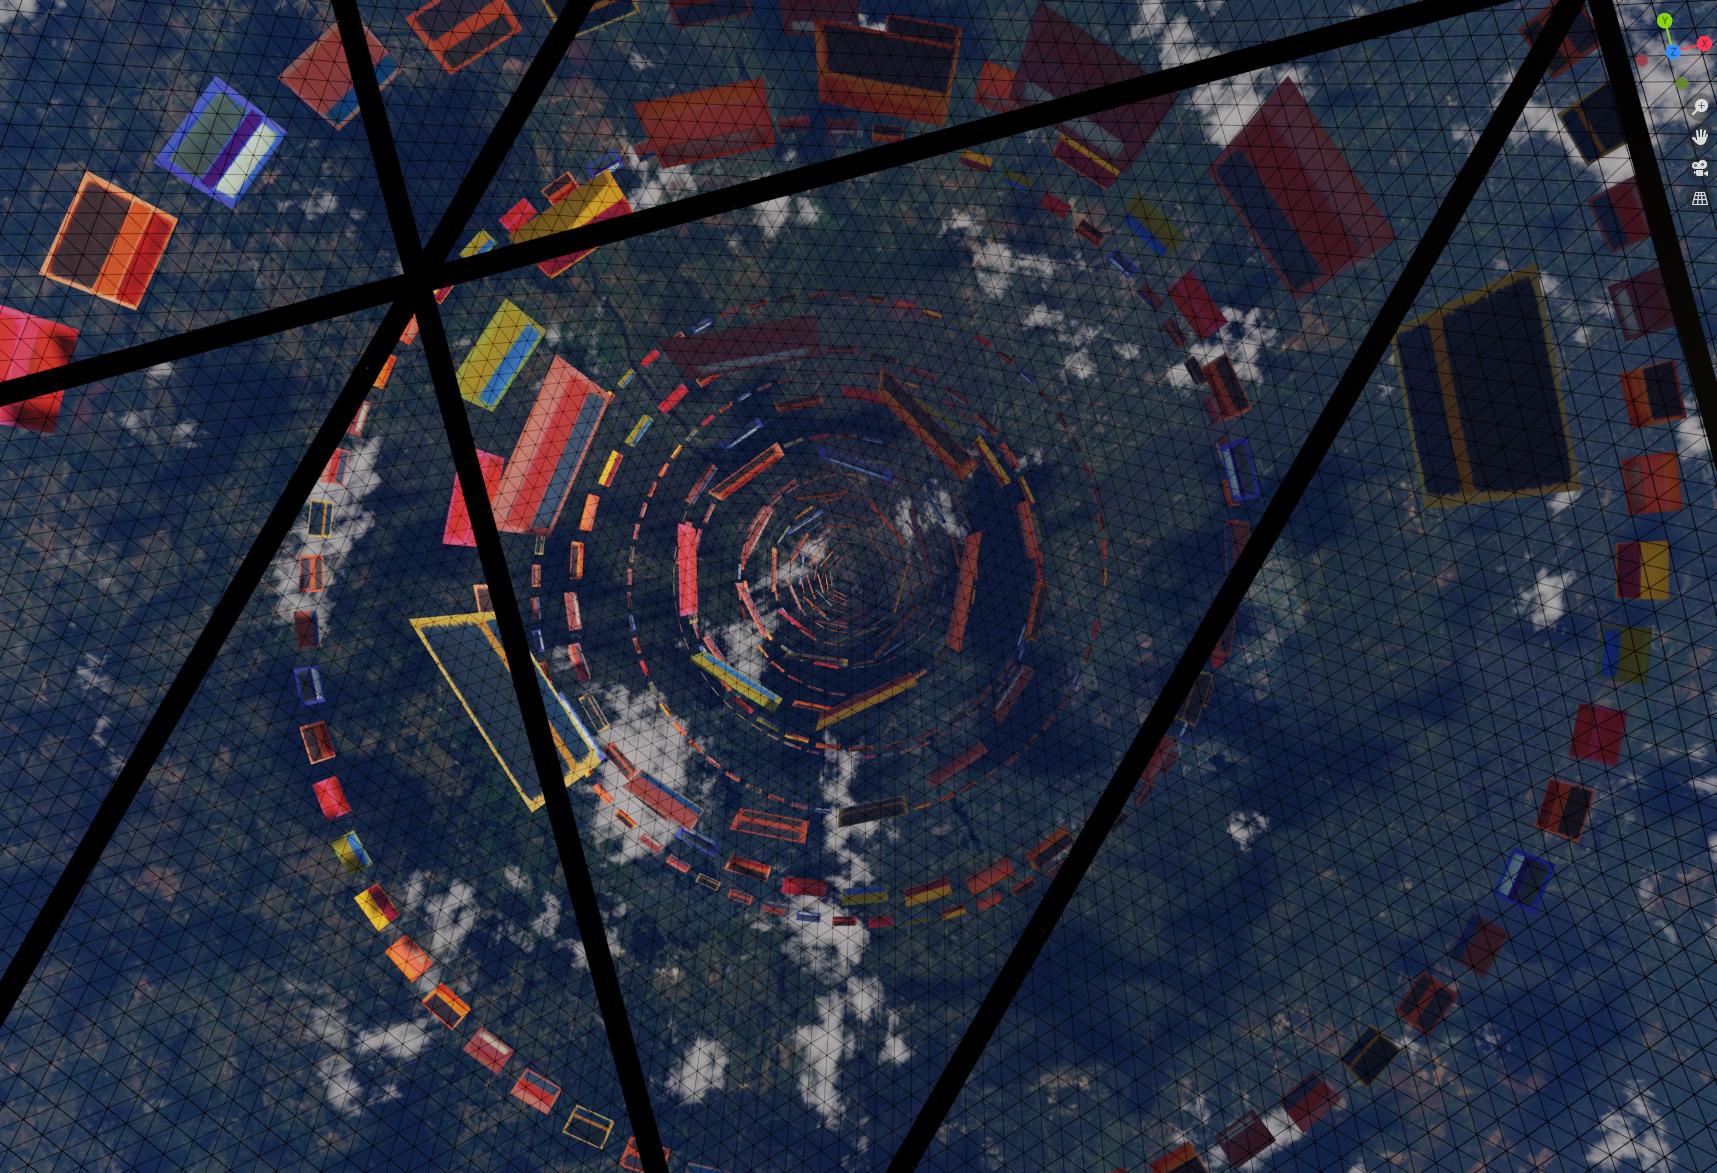 The Curved Horizon. The Rothko Lift